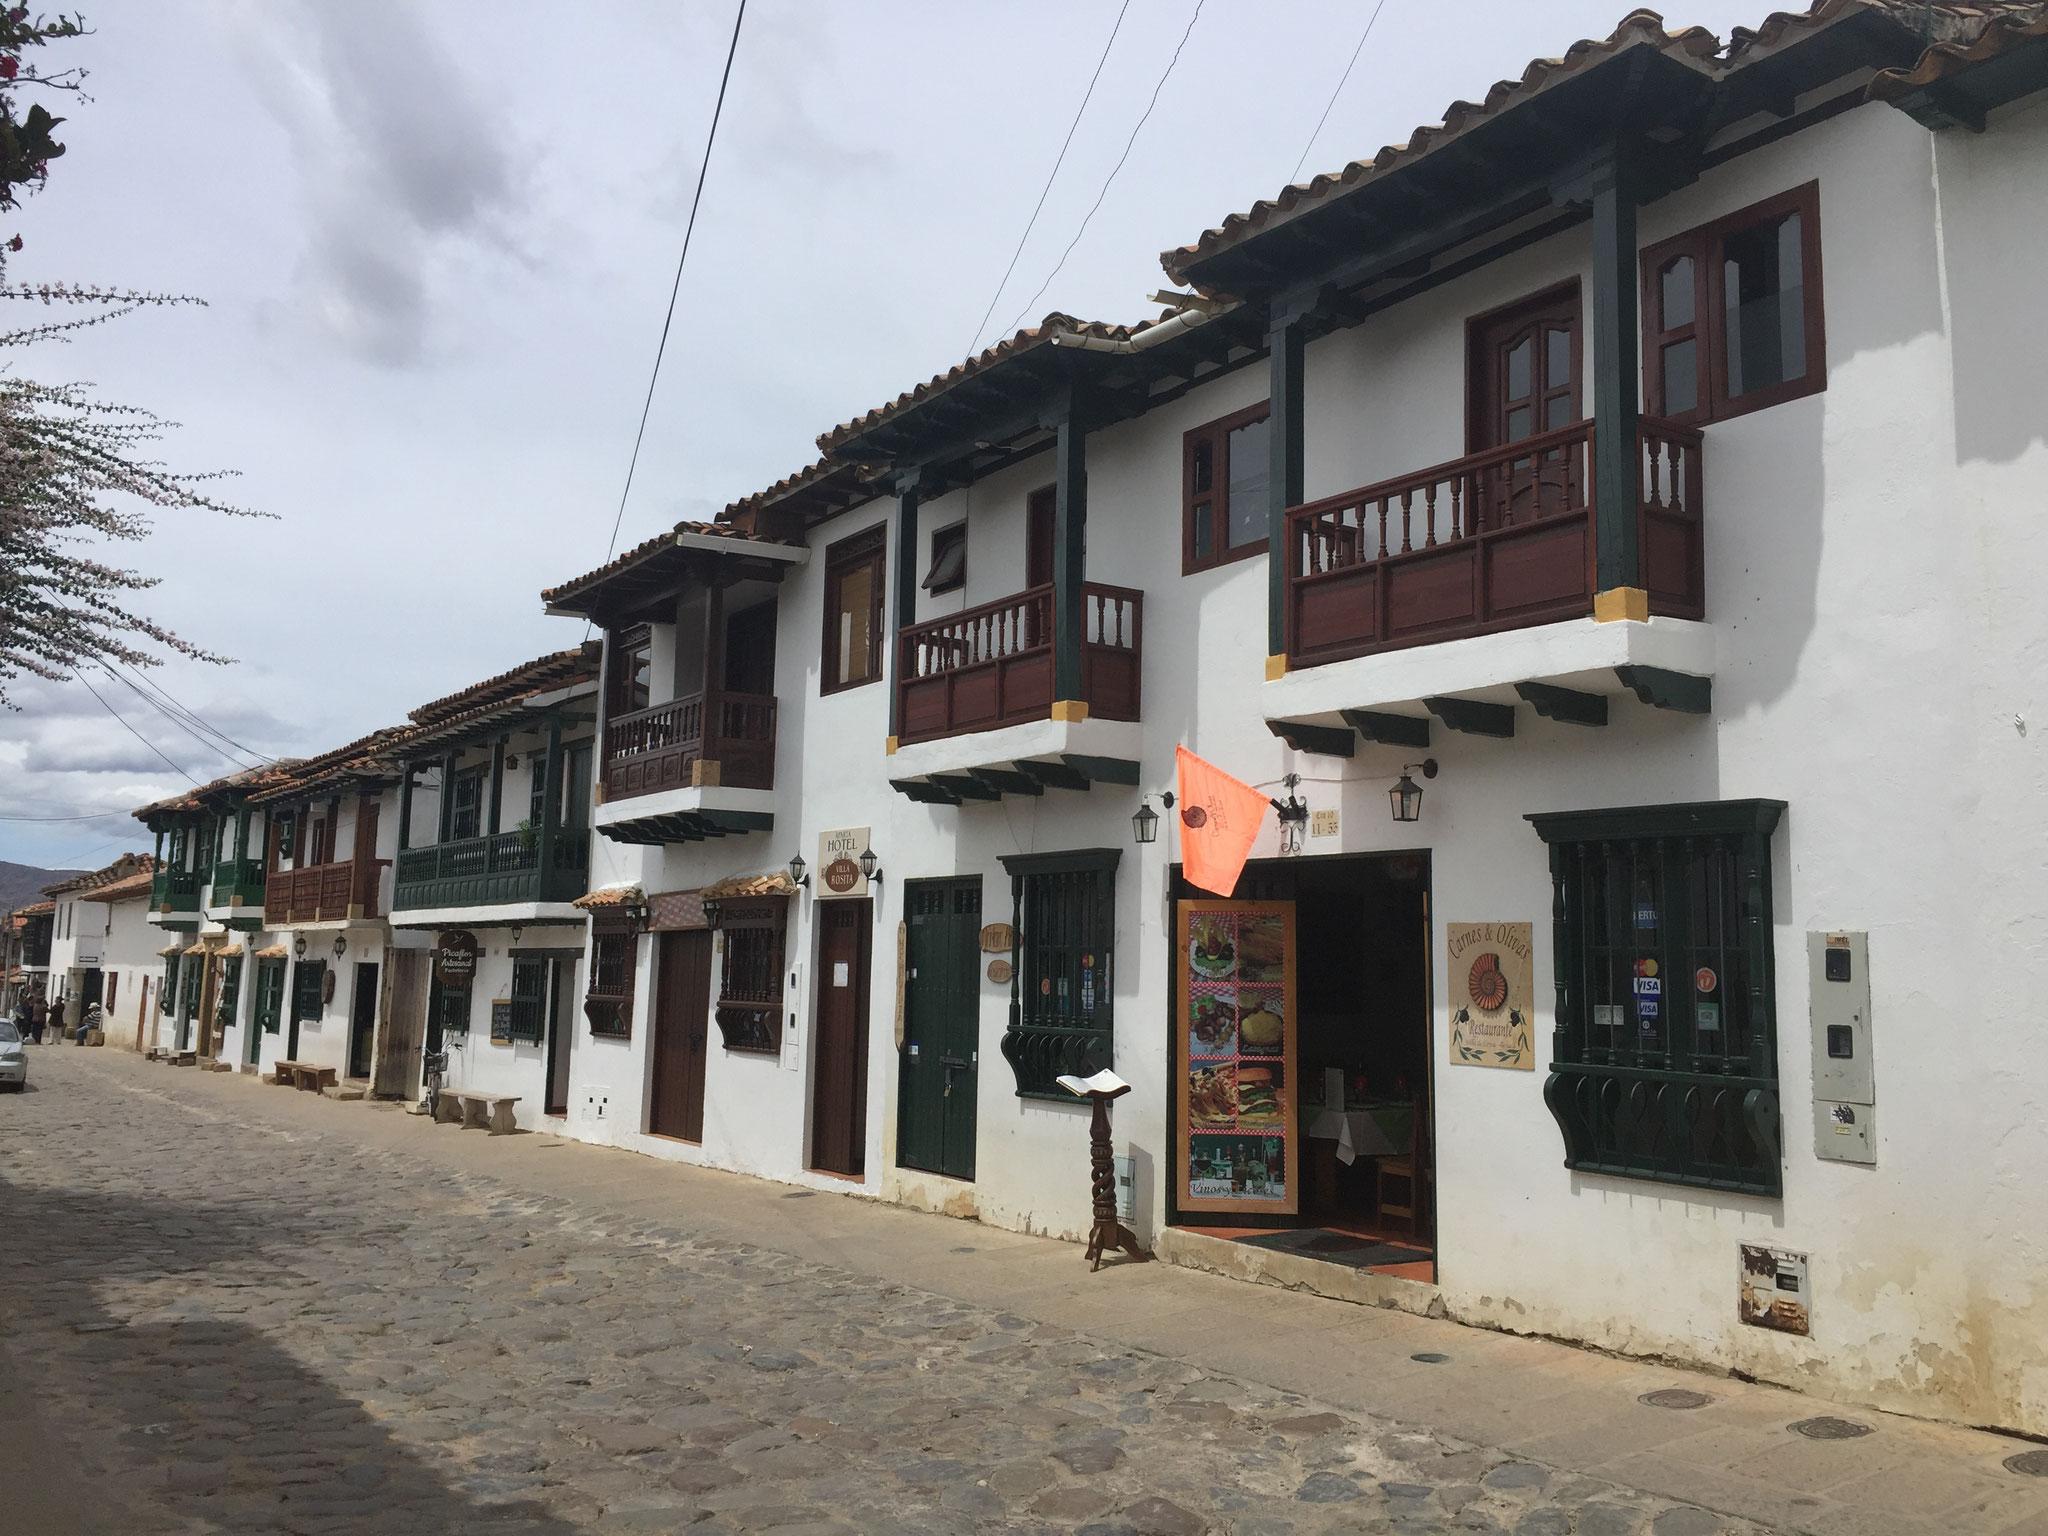 Villa de Leyva ......